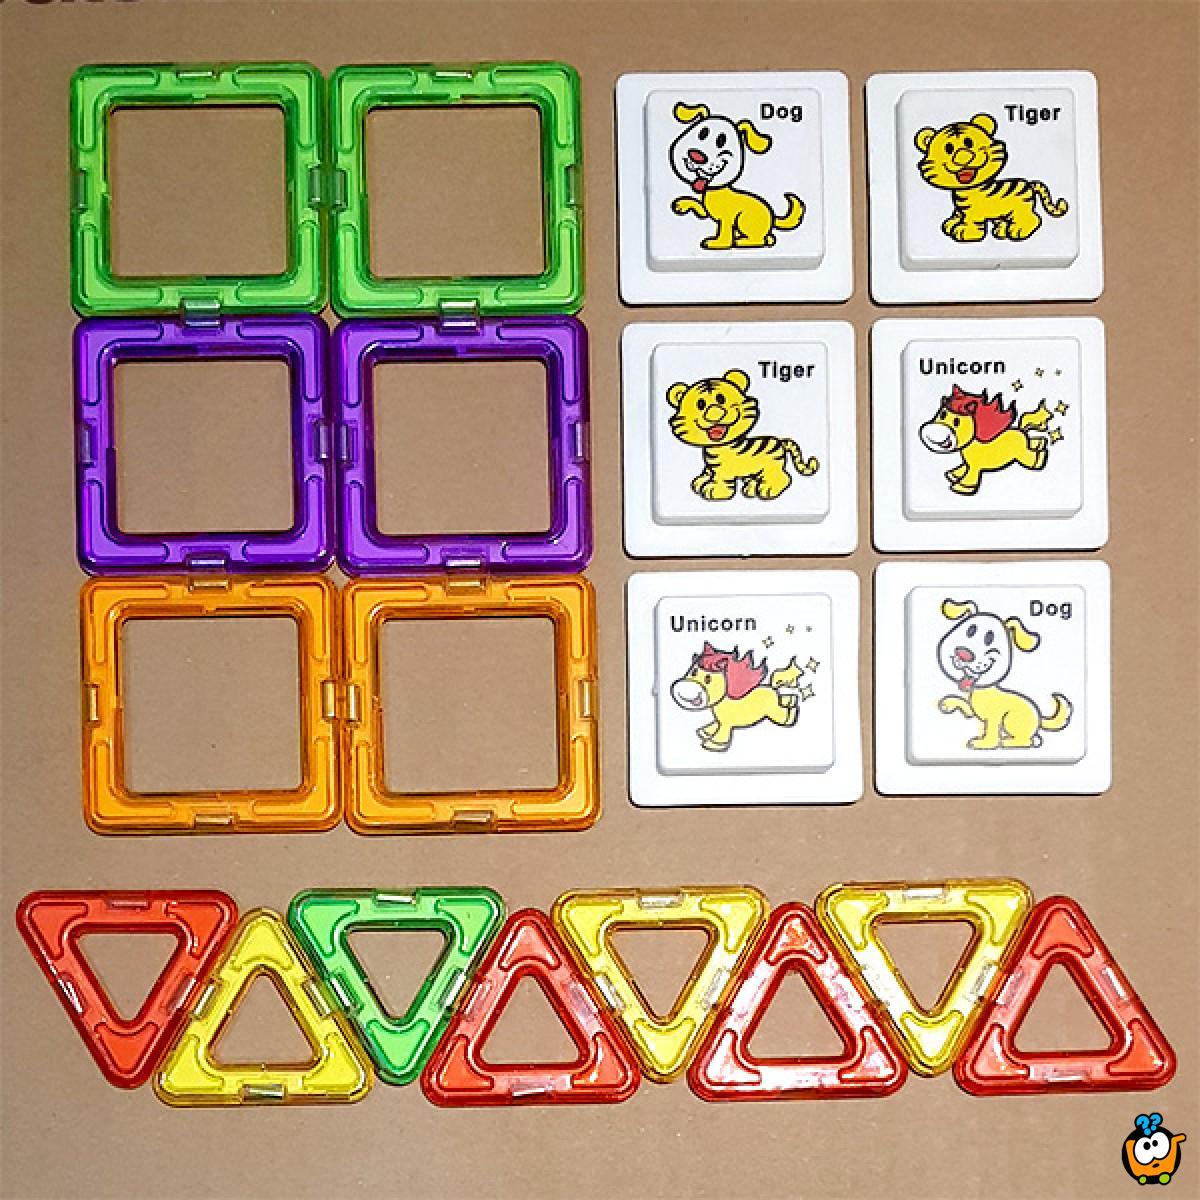 Magična magnetna 3D slagalica za decu